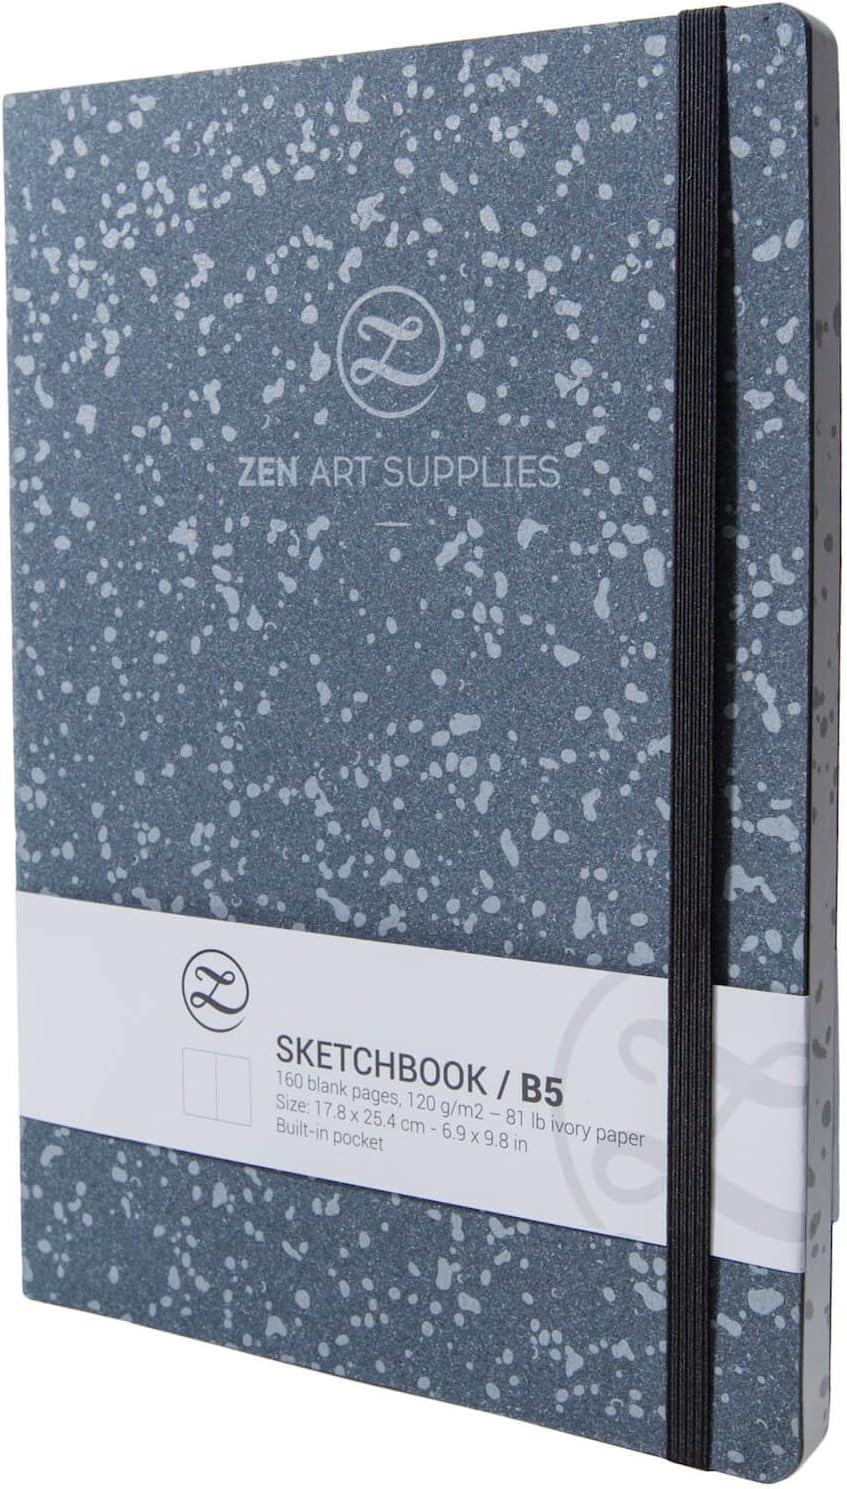 2 segnalibri e Fascia Elastica Copertina in Pelle Resistente Tasca Interna 160 Pagine Bianche in Carta Avorio Liscia 120 gsm Senza acidi 18 x 24 cm ZenART Blocco per Schizzi B5